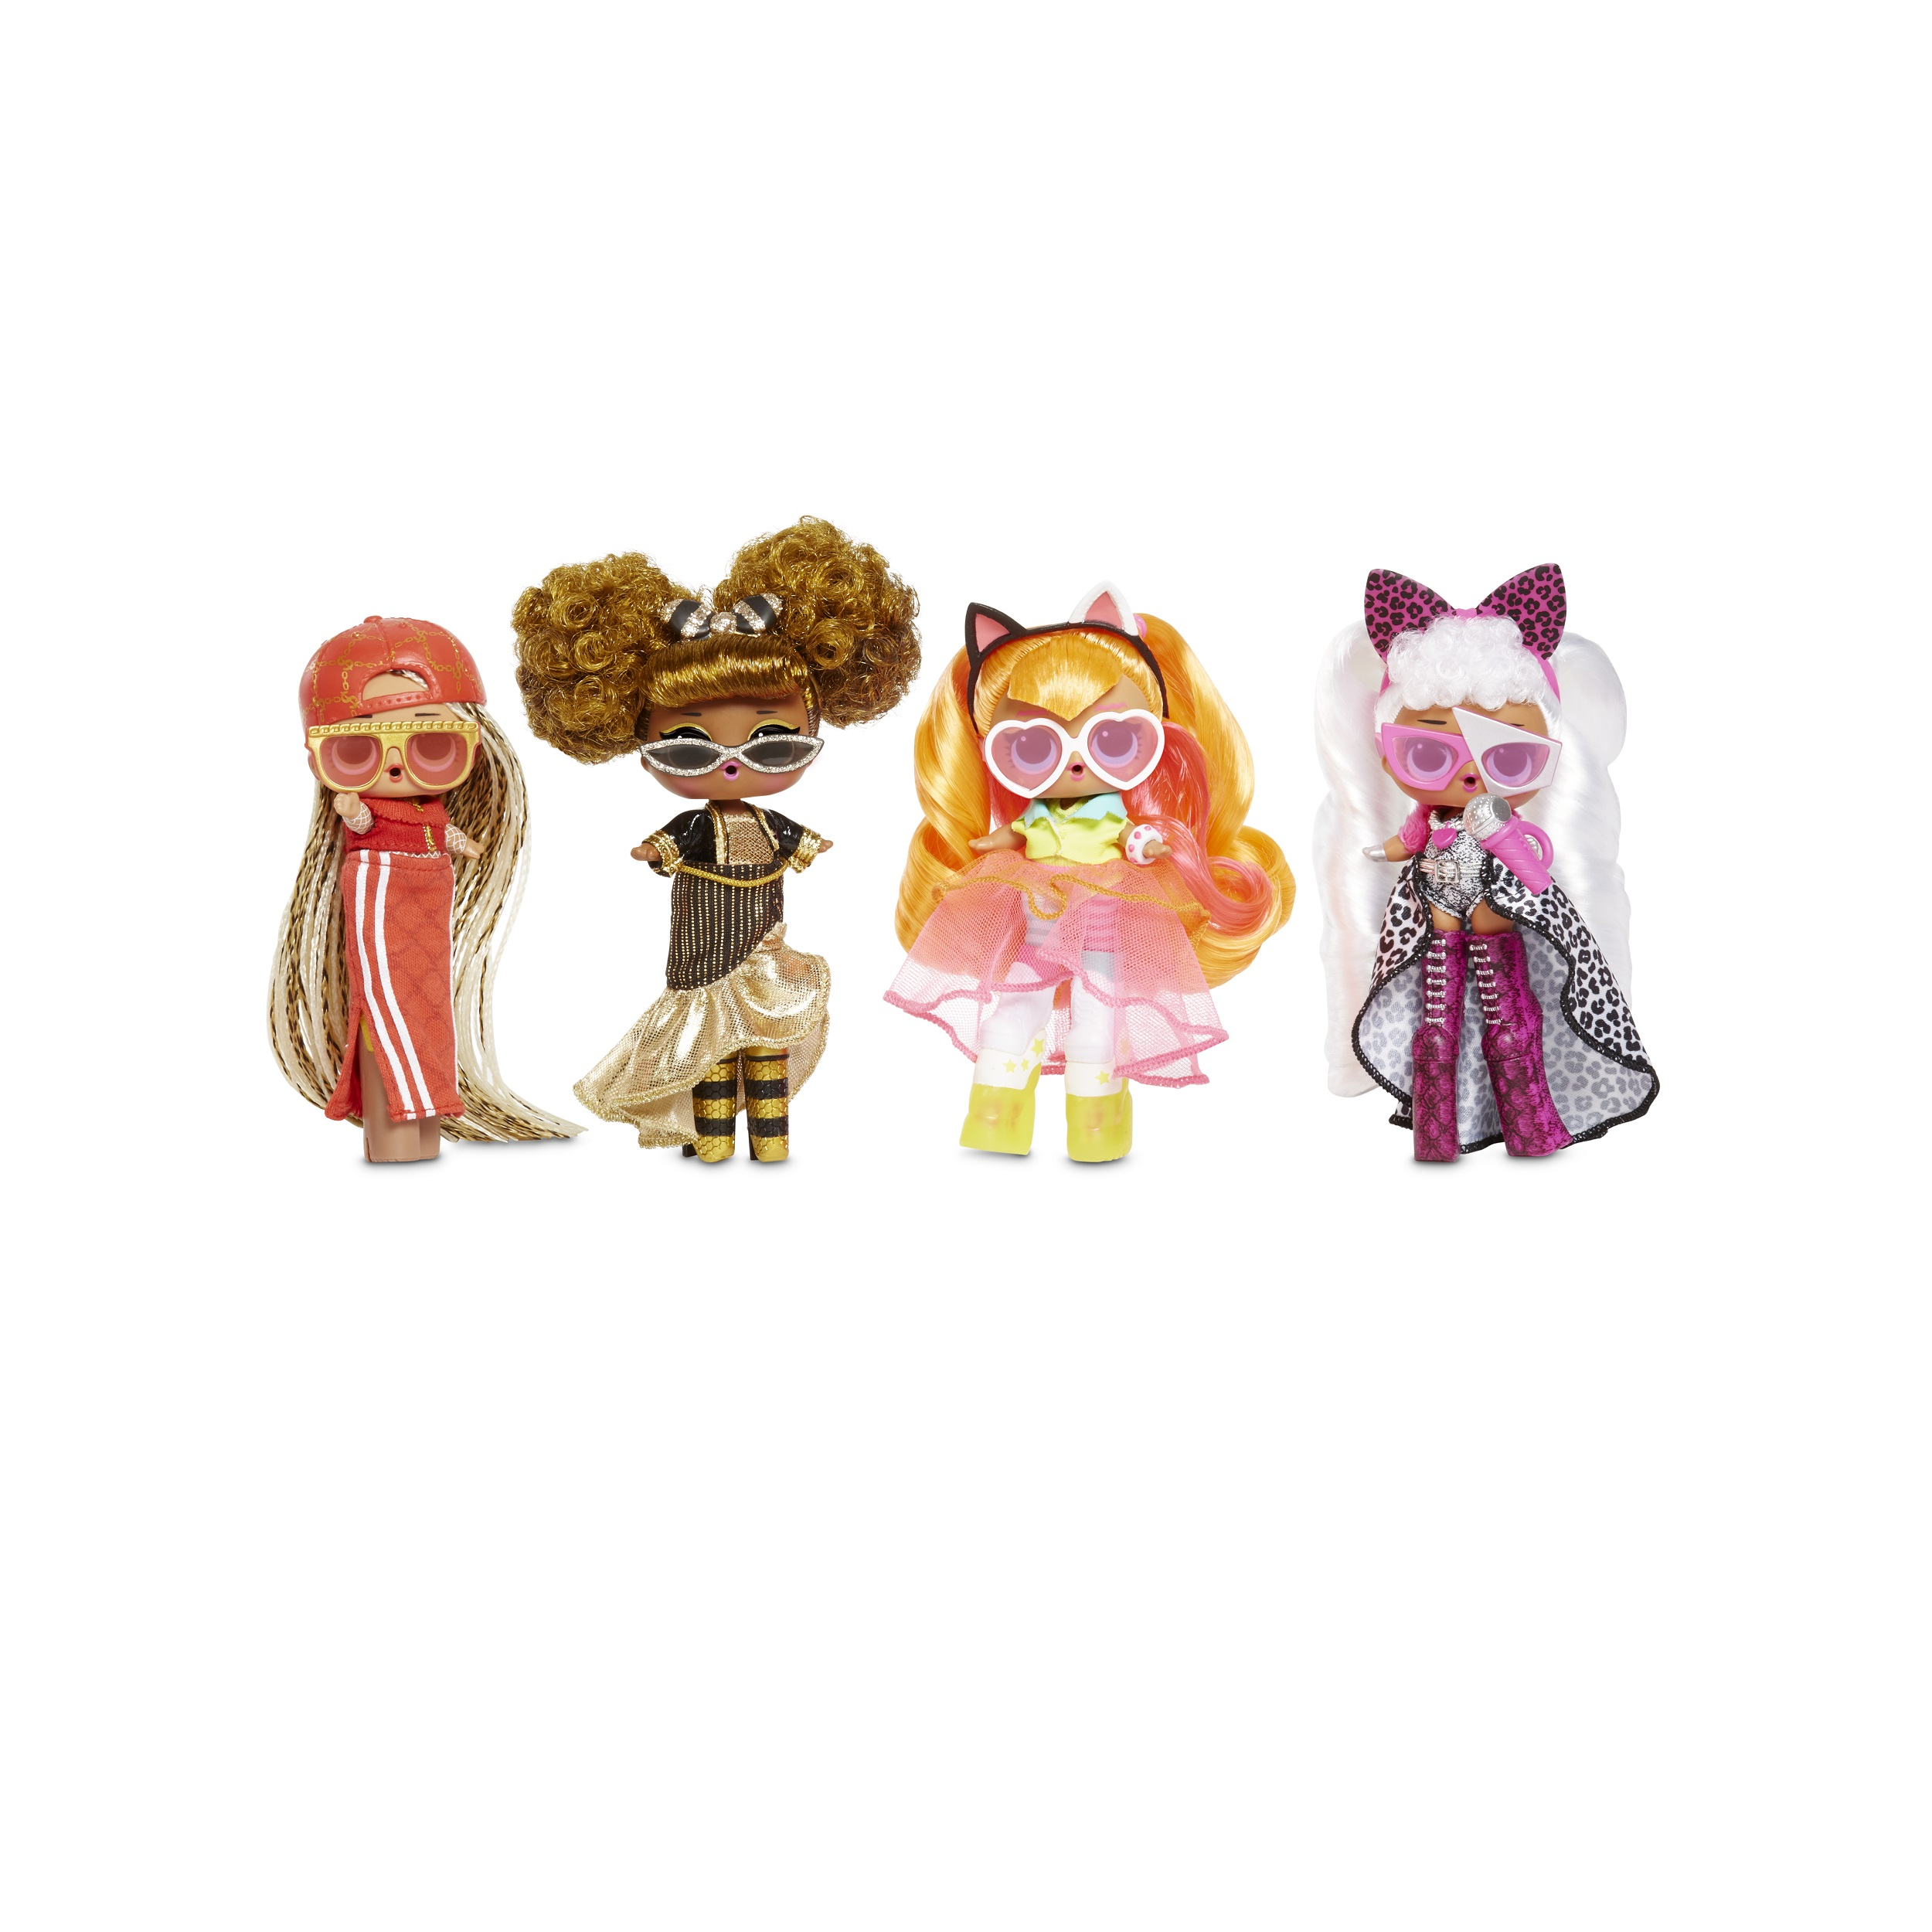 Series 1 NEW LOL Surprise JK Queen Bee Fashion Doll w 15 Surprises